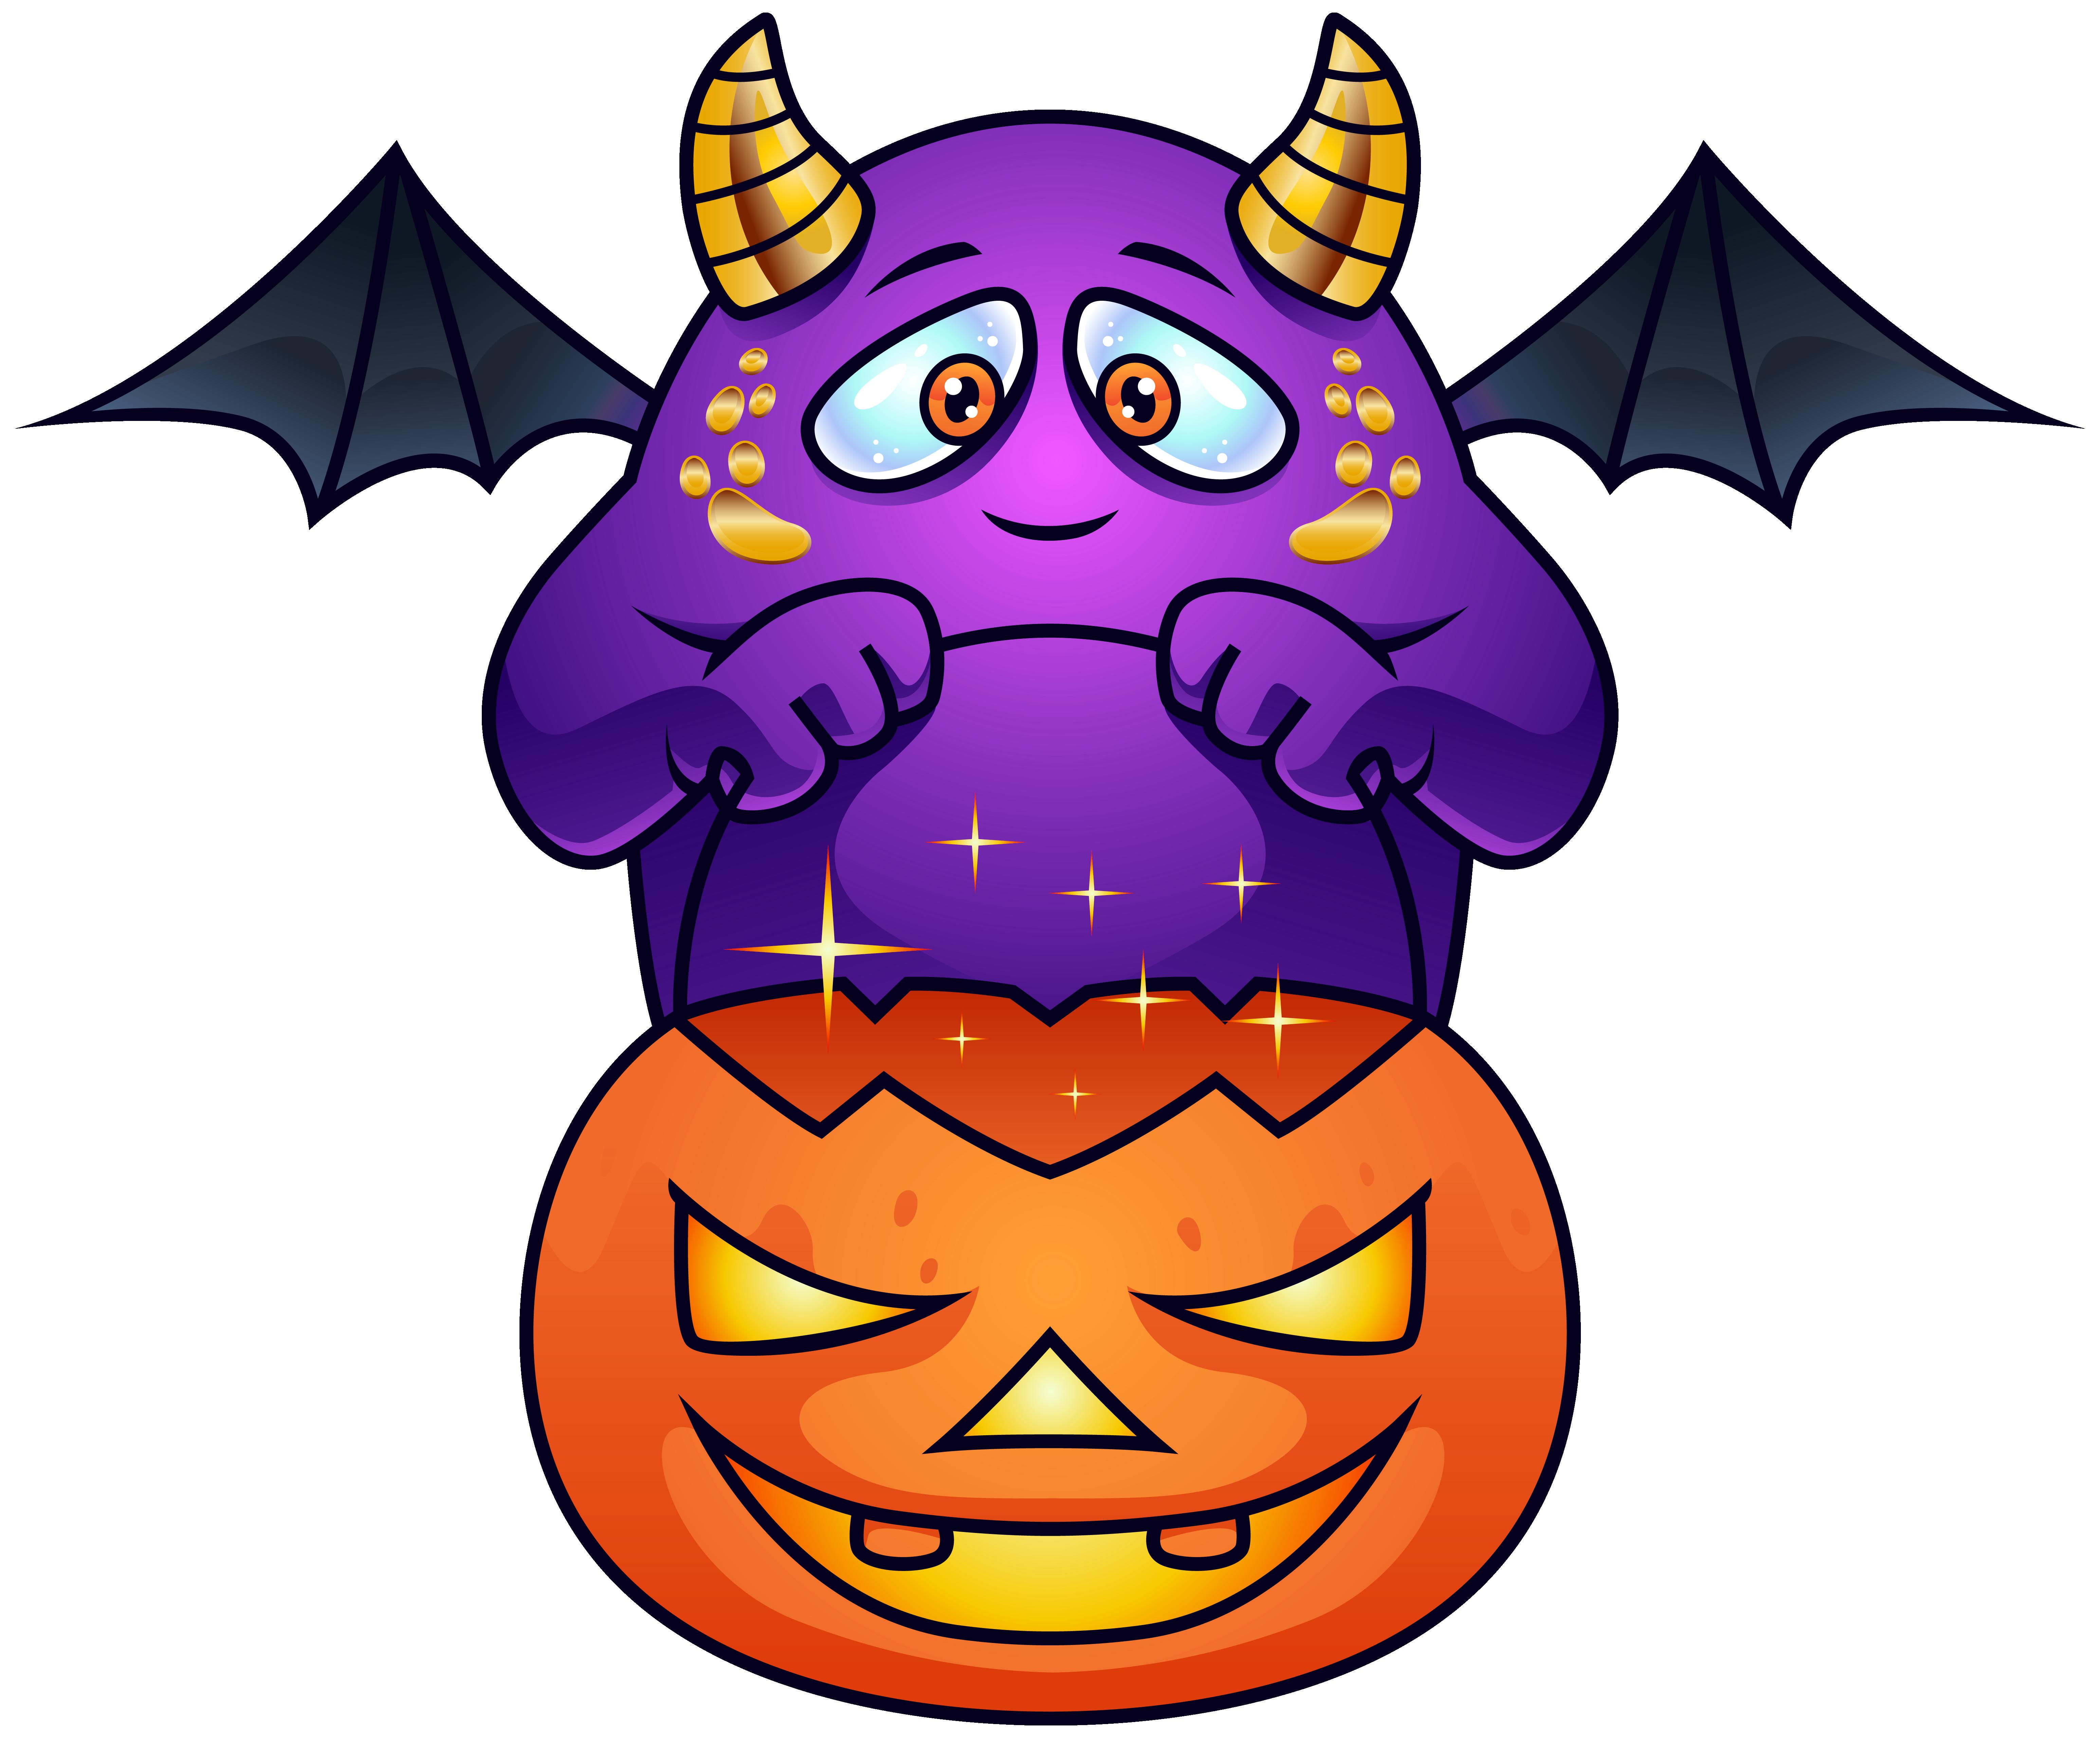 6185x5120 Purple Halloween Monster Png Clipart Imageu200b Gallery Yopriceville